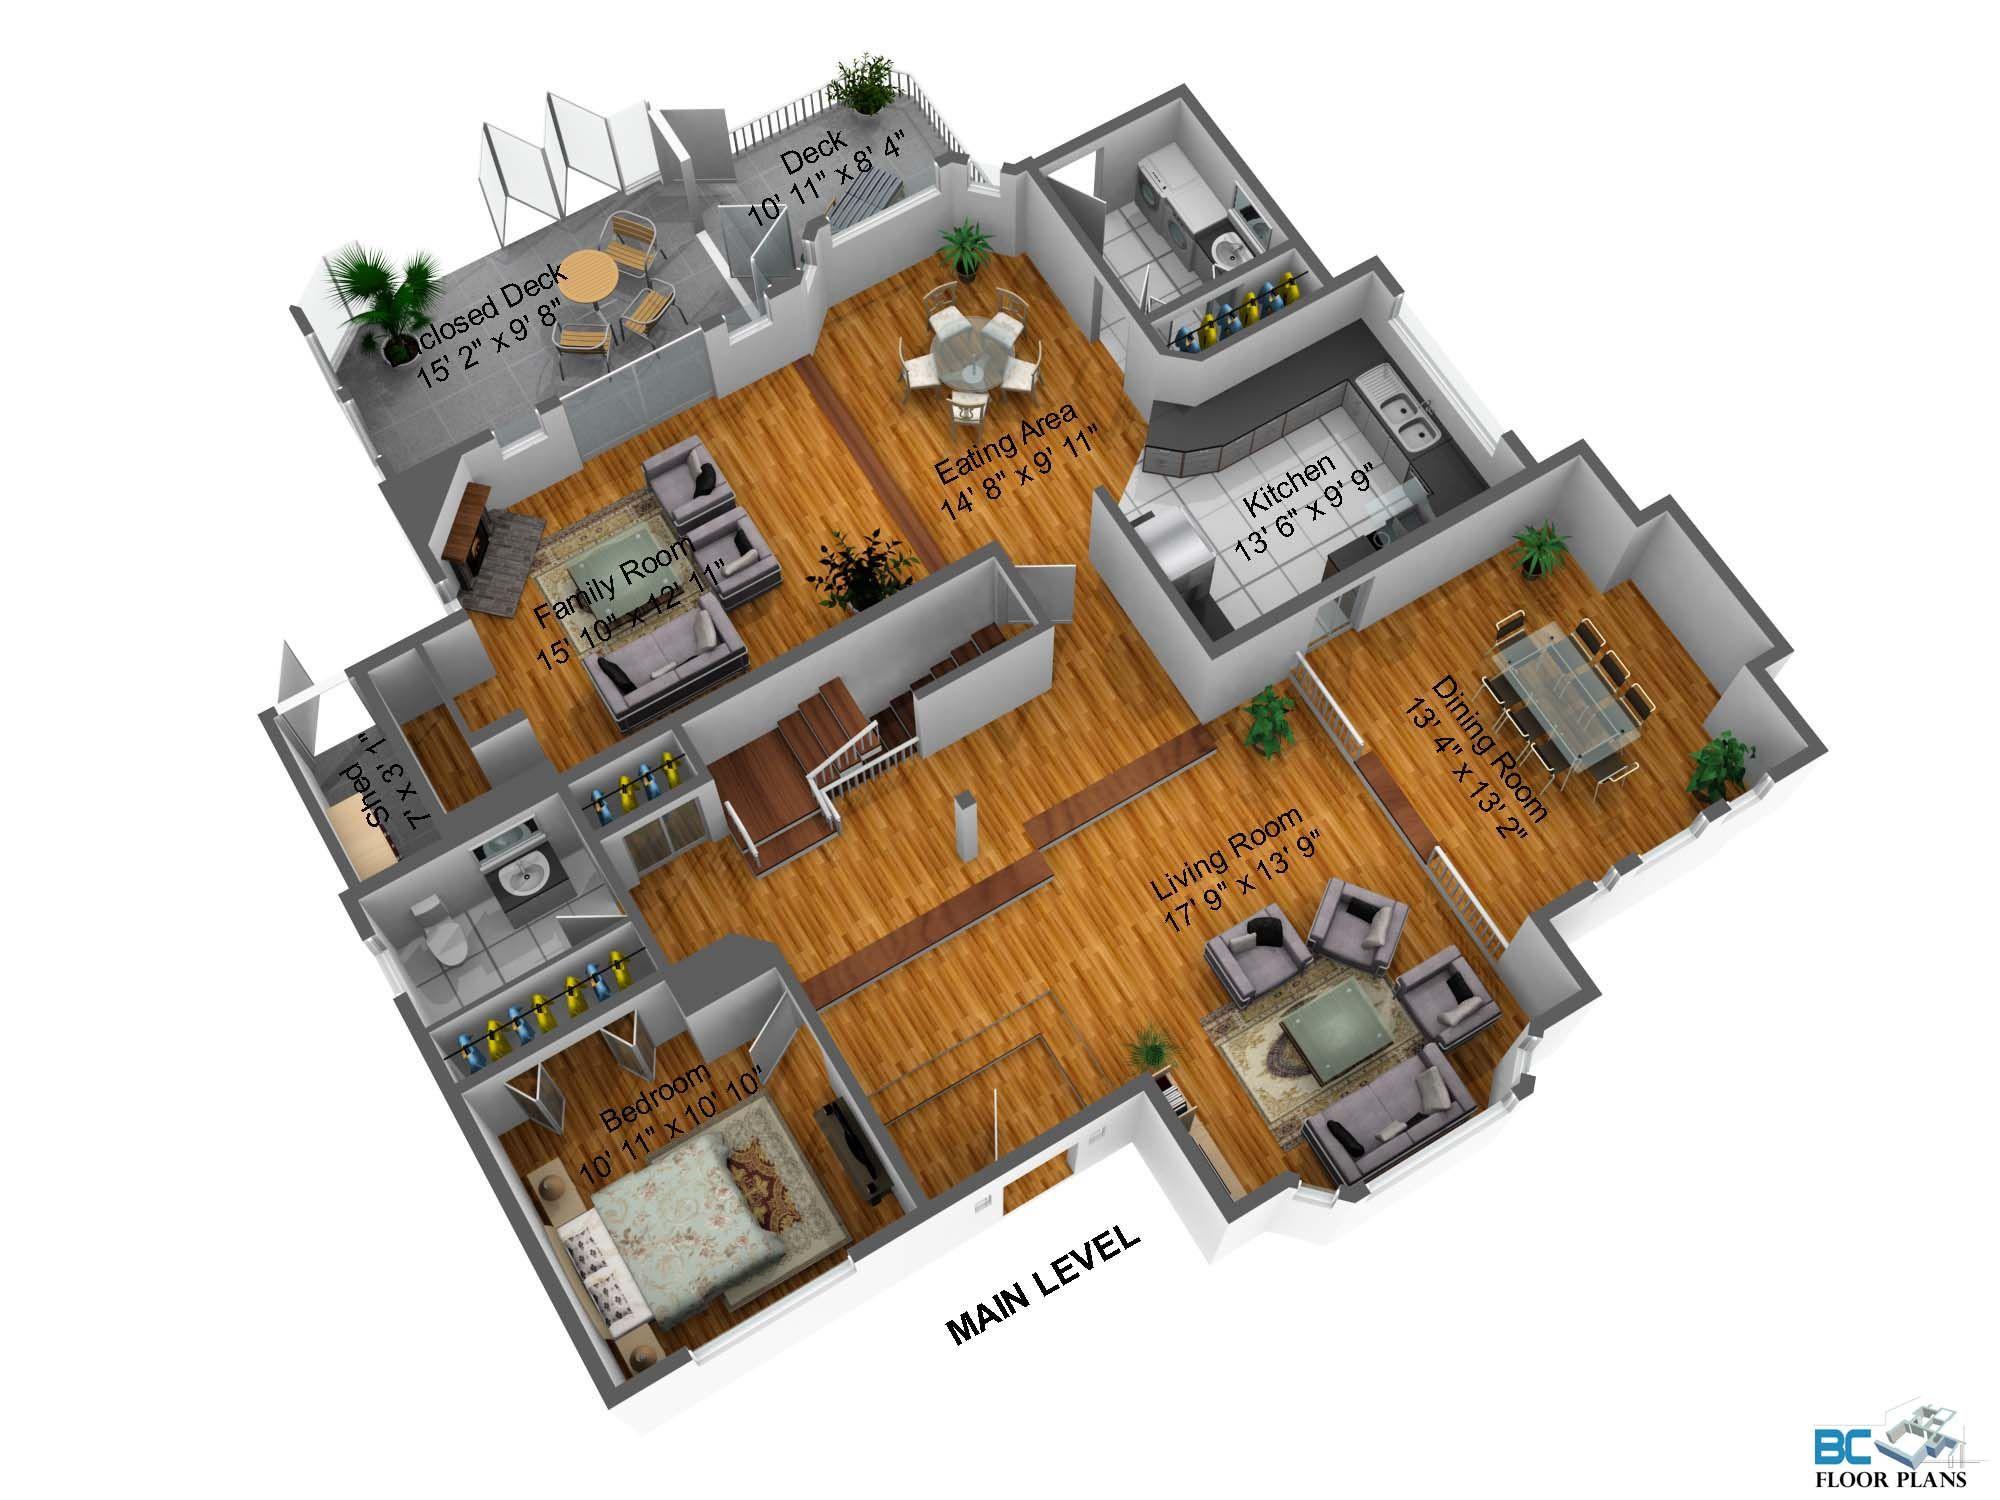 SOLD SOLD SOLD 775 Citadel Drive, Port Coquitlam $828,000 Main Level